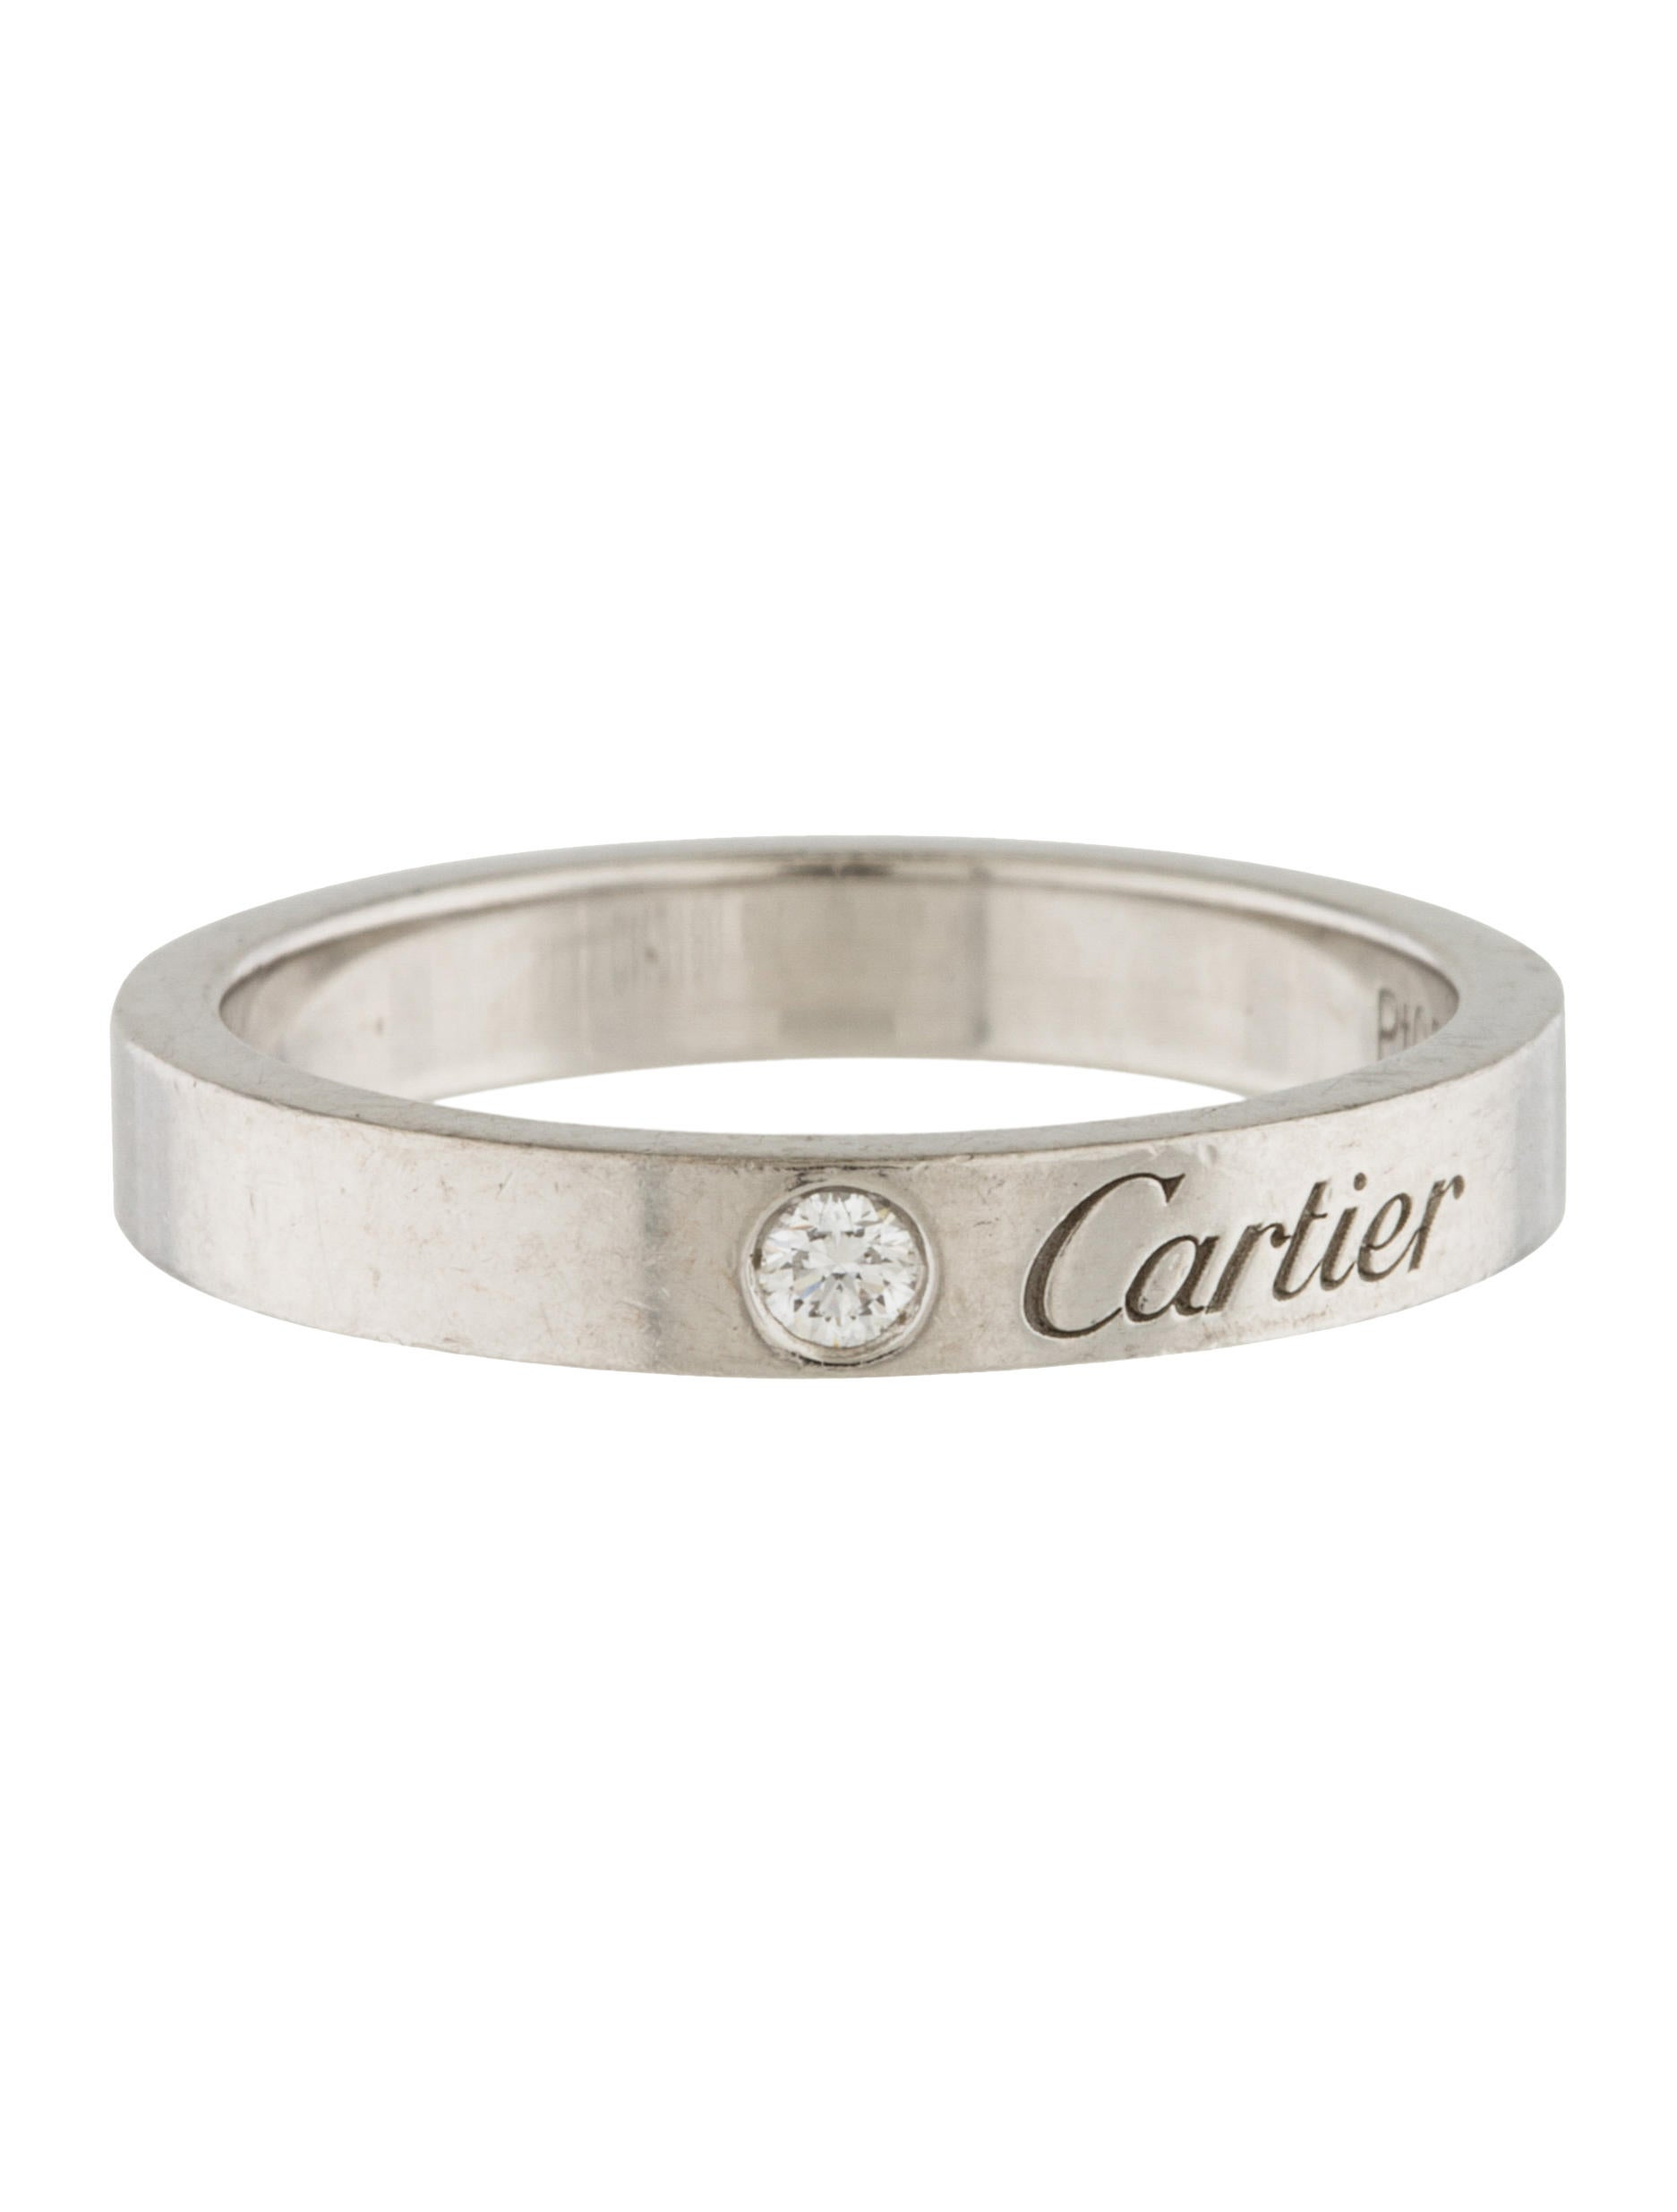 c de cartier wedding band - Cartier Wedding Rings